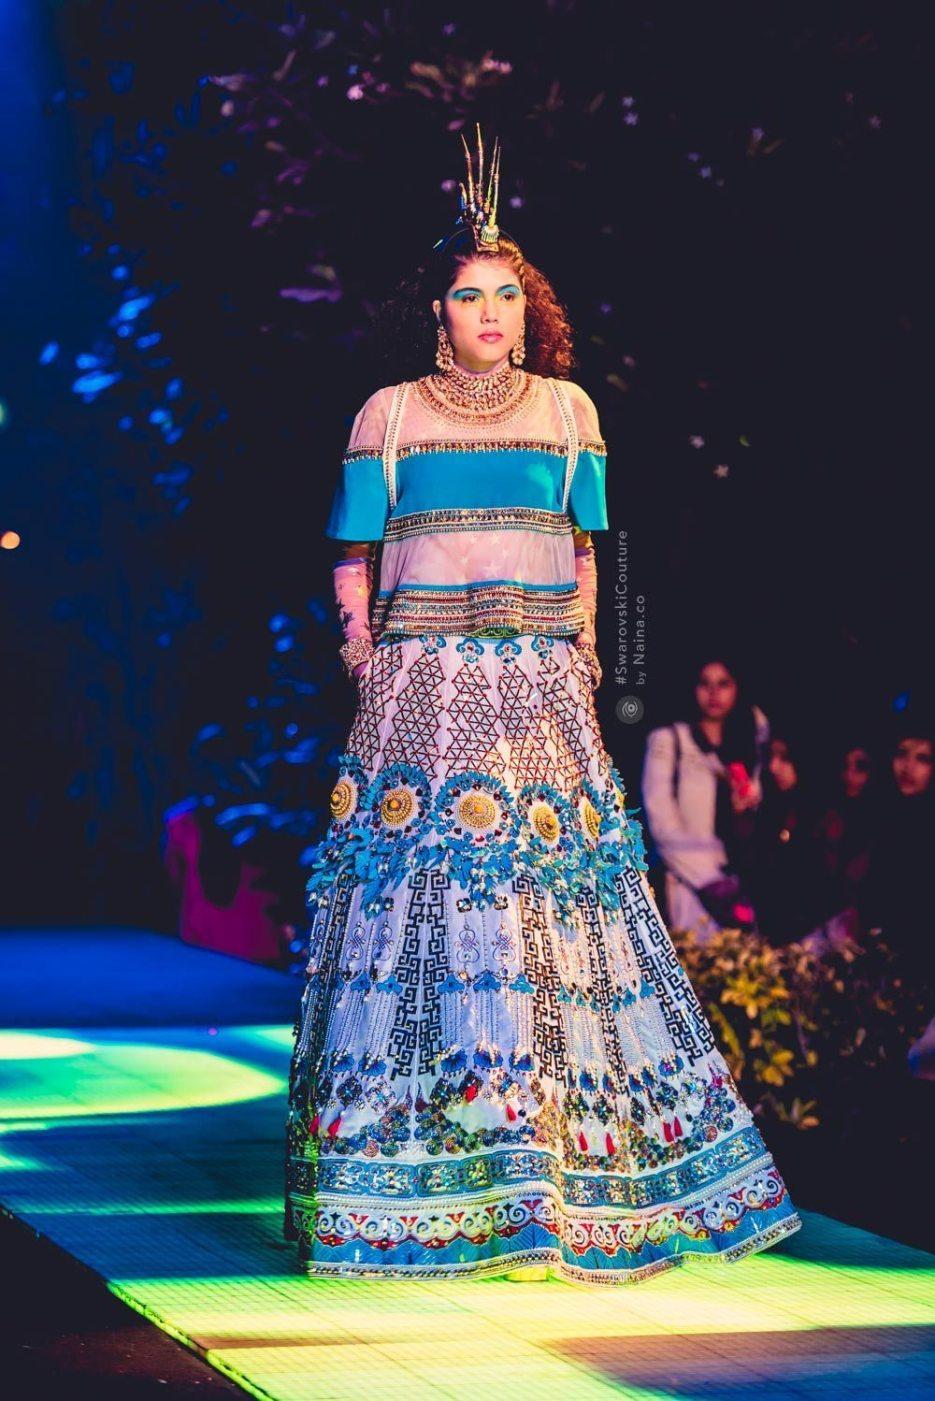 Indian by Manish Arora #SwarovskiCouture #SwarovskiCrystals Swarovski India, Naina.co Luxury Lifestyle Photographer Blogger Experience Collector